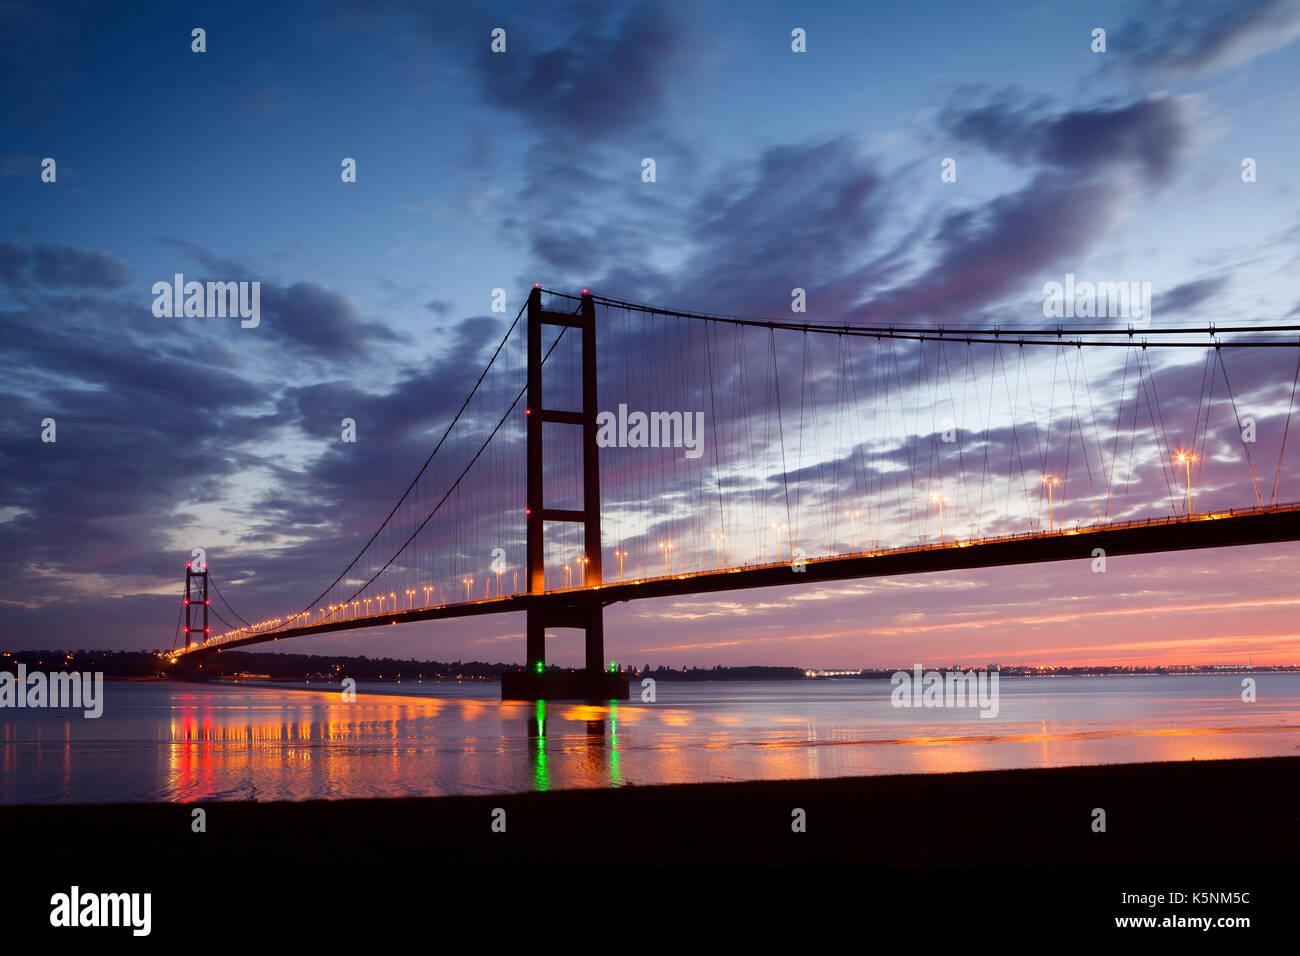 North Lincolnshire, UK. 10th September, 2017. UK Weather: The Humber Bridge before sunrise. Barton-upon-Humber, North Lincolnshire, UK. 10th September 2017. Credit: LEE BEEL/Alamy Live News - Stock Image